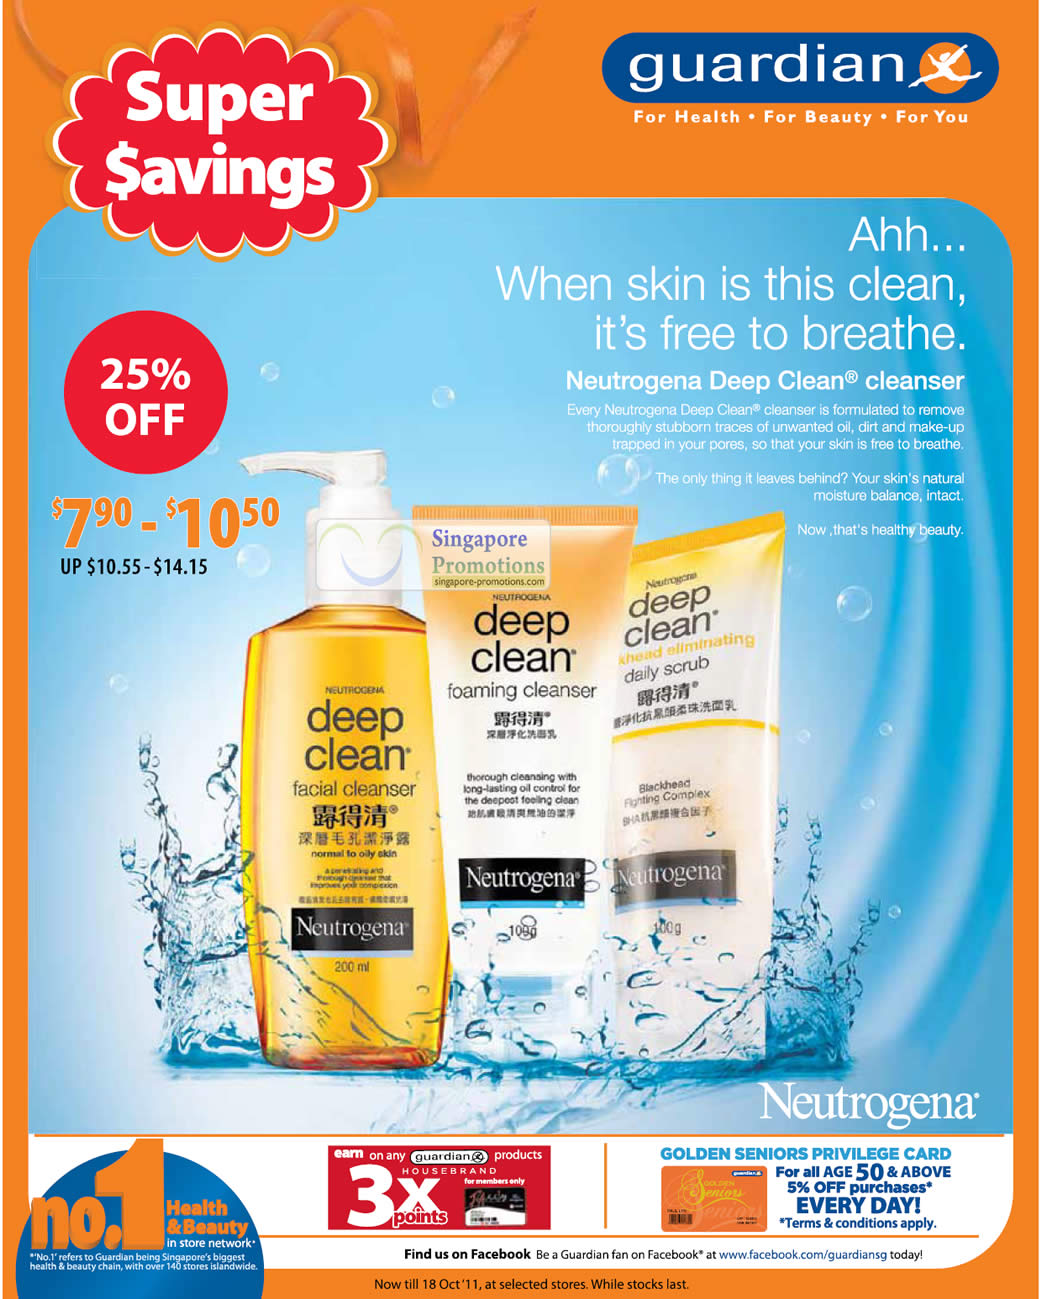 Neutrogena Deep Clean Cleanser